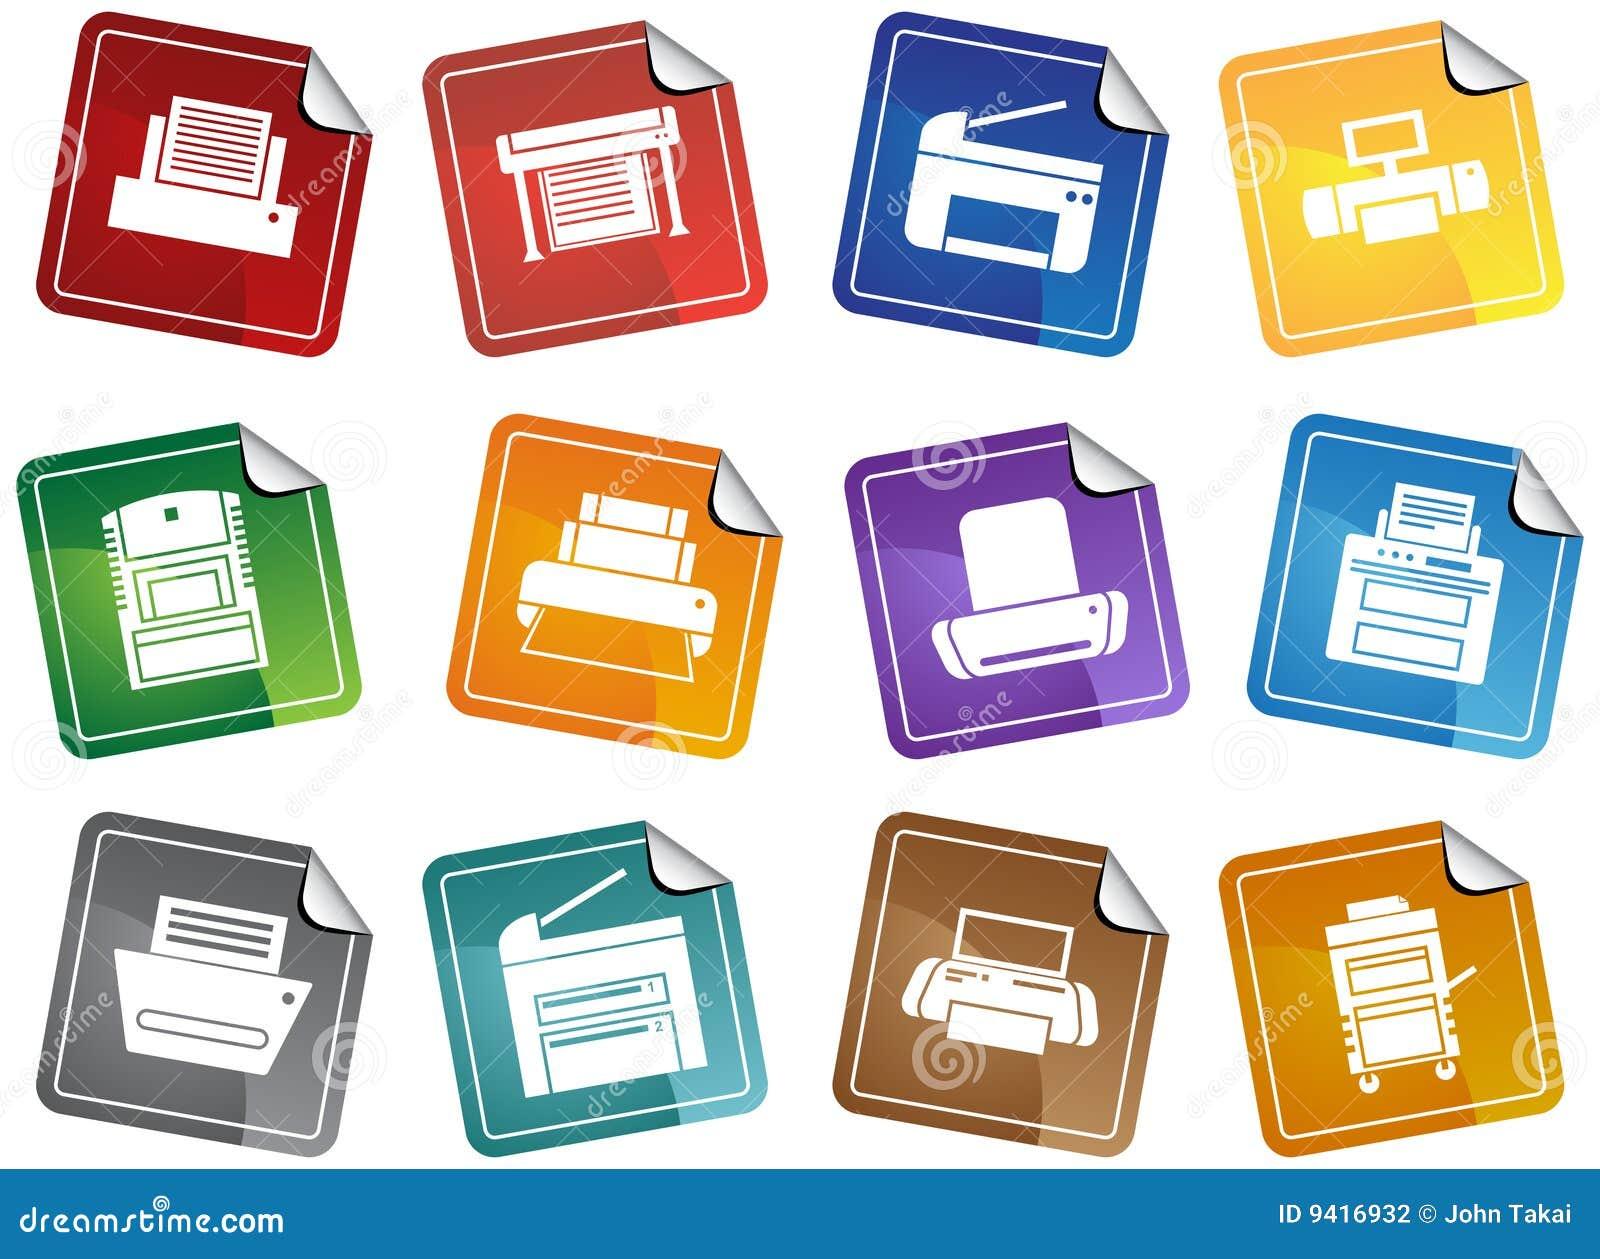 Drucker Tasten Aufkleber Vektor Abbildung Illustration